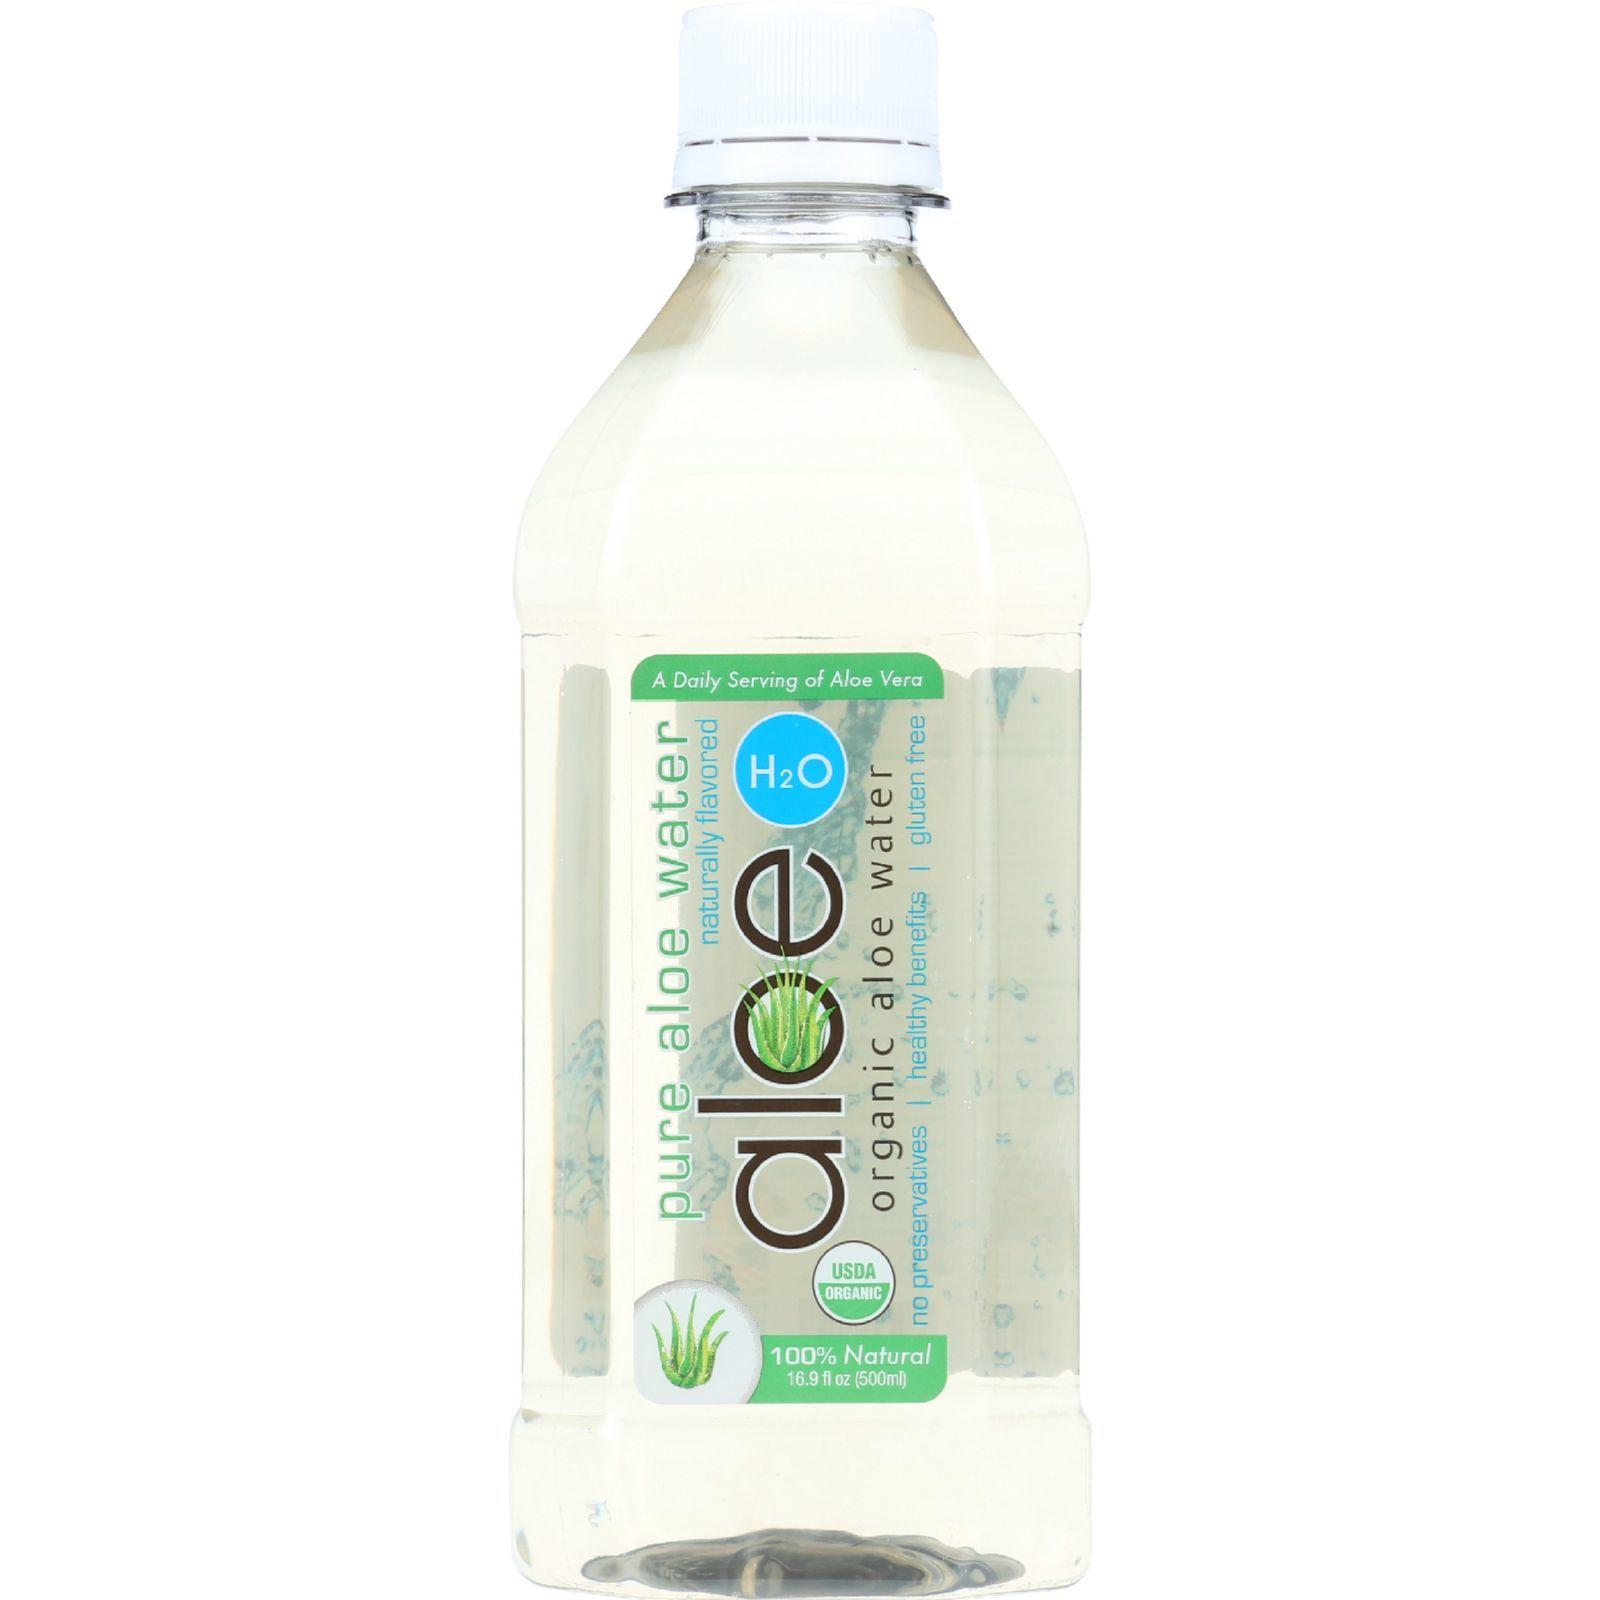 Lily Of The Desert Aloe H2O - Organic - Original - Gluten Free - 16.9 oz - case of 12